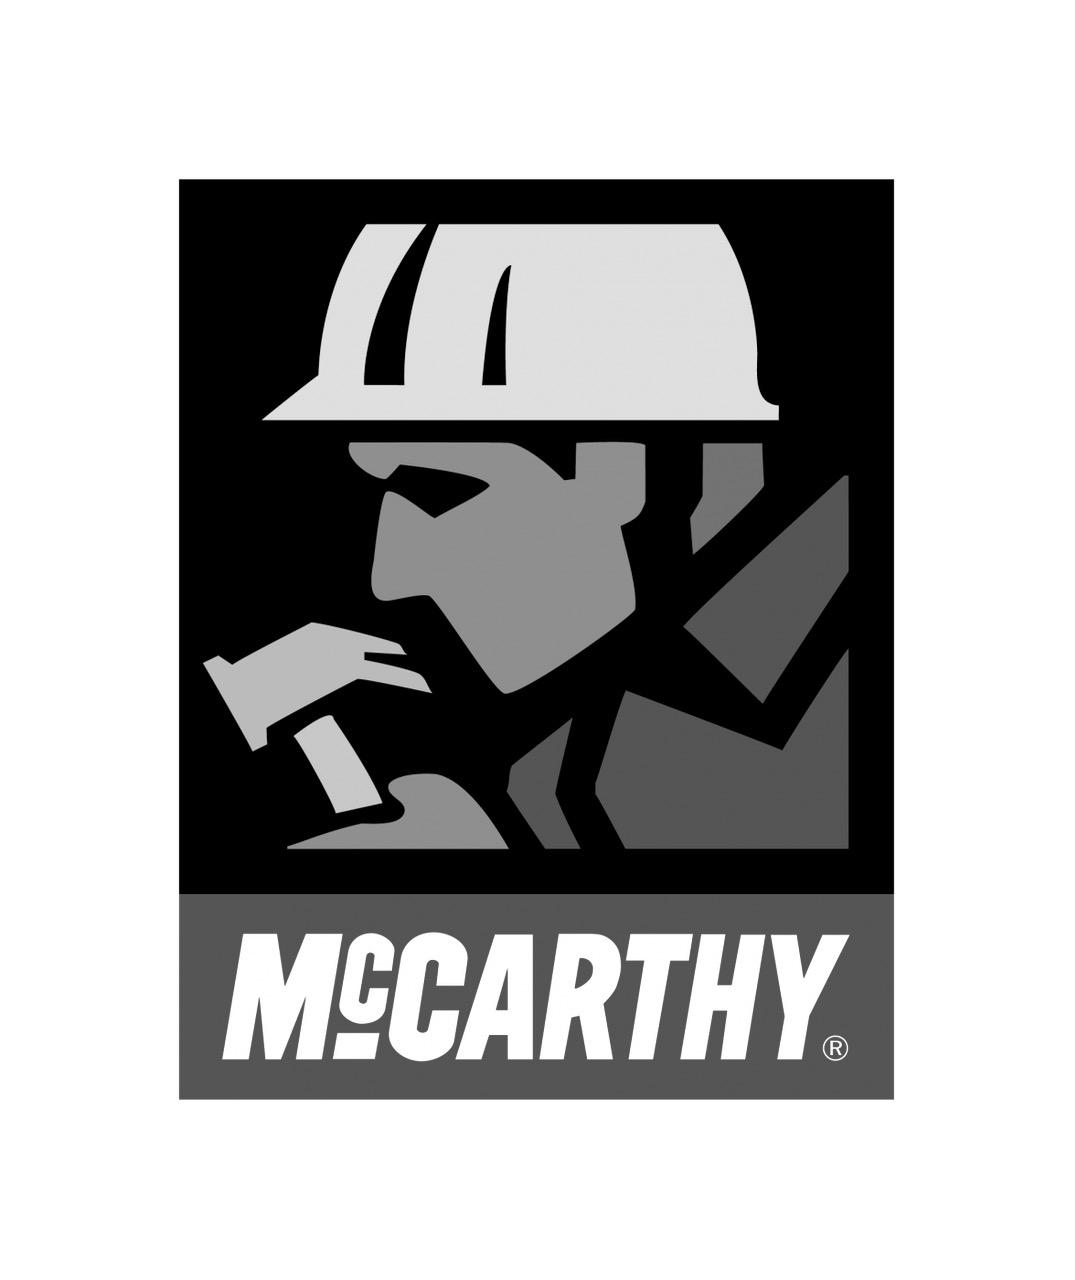 McCarthyBuilding_LogoUnit_RGB.jpg